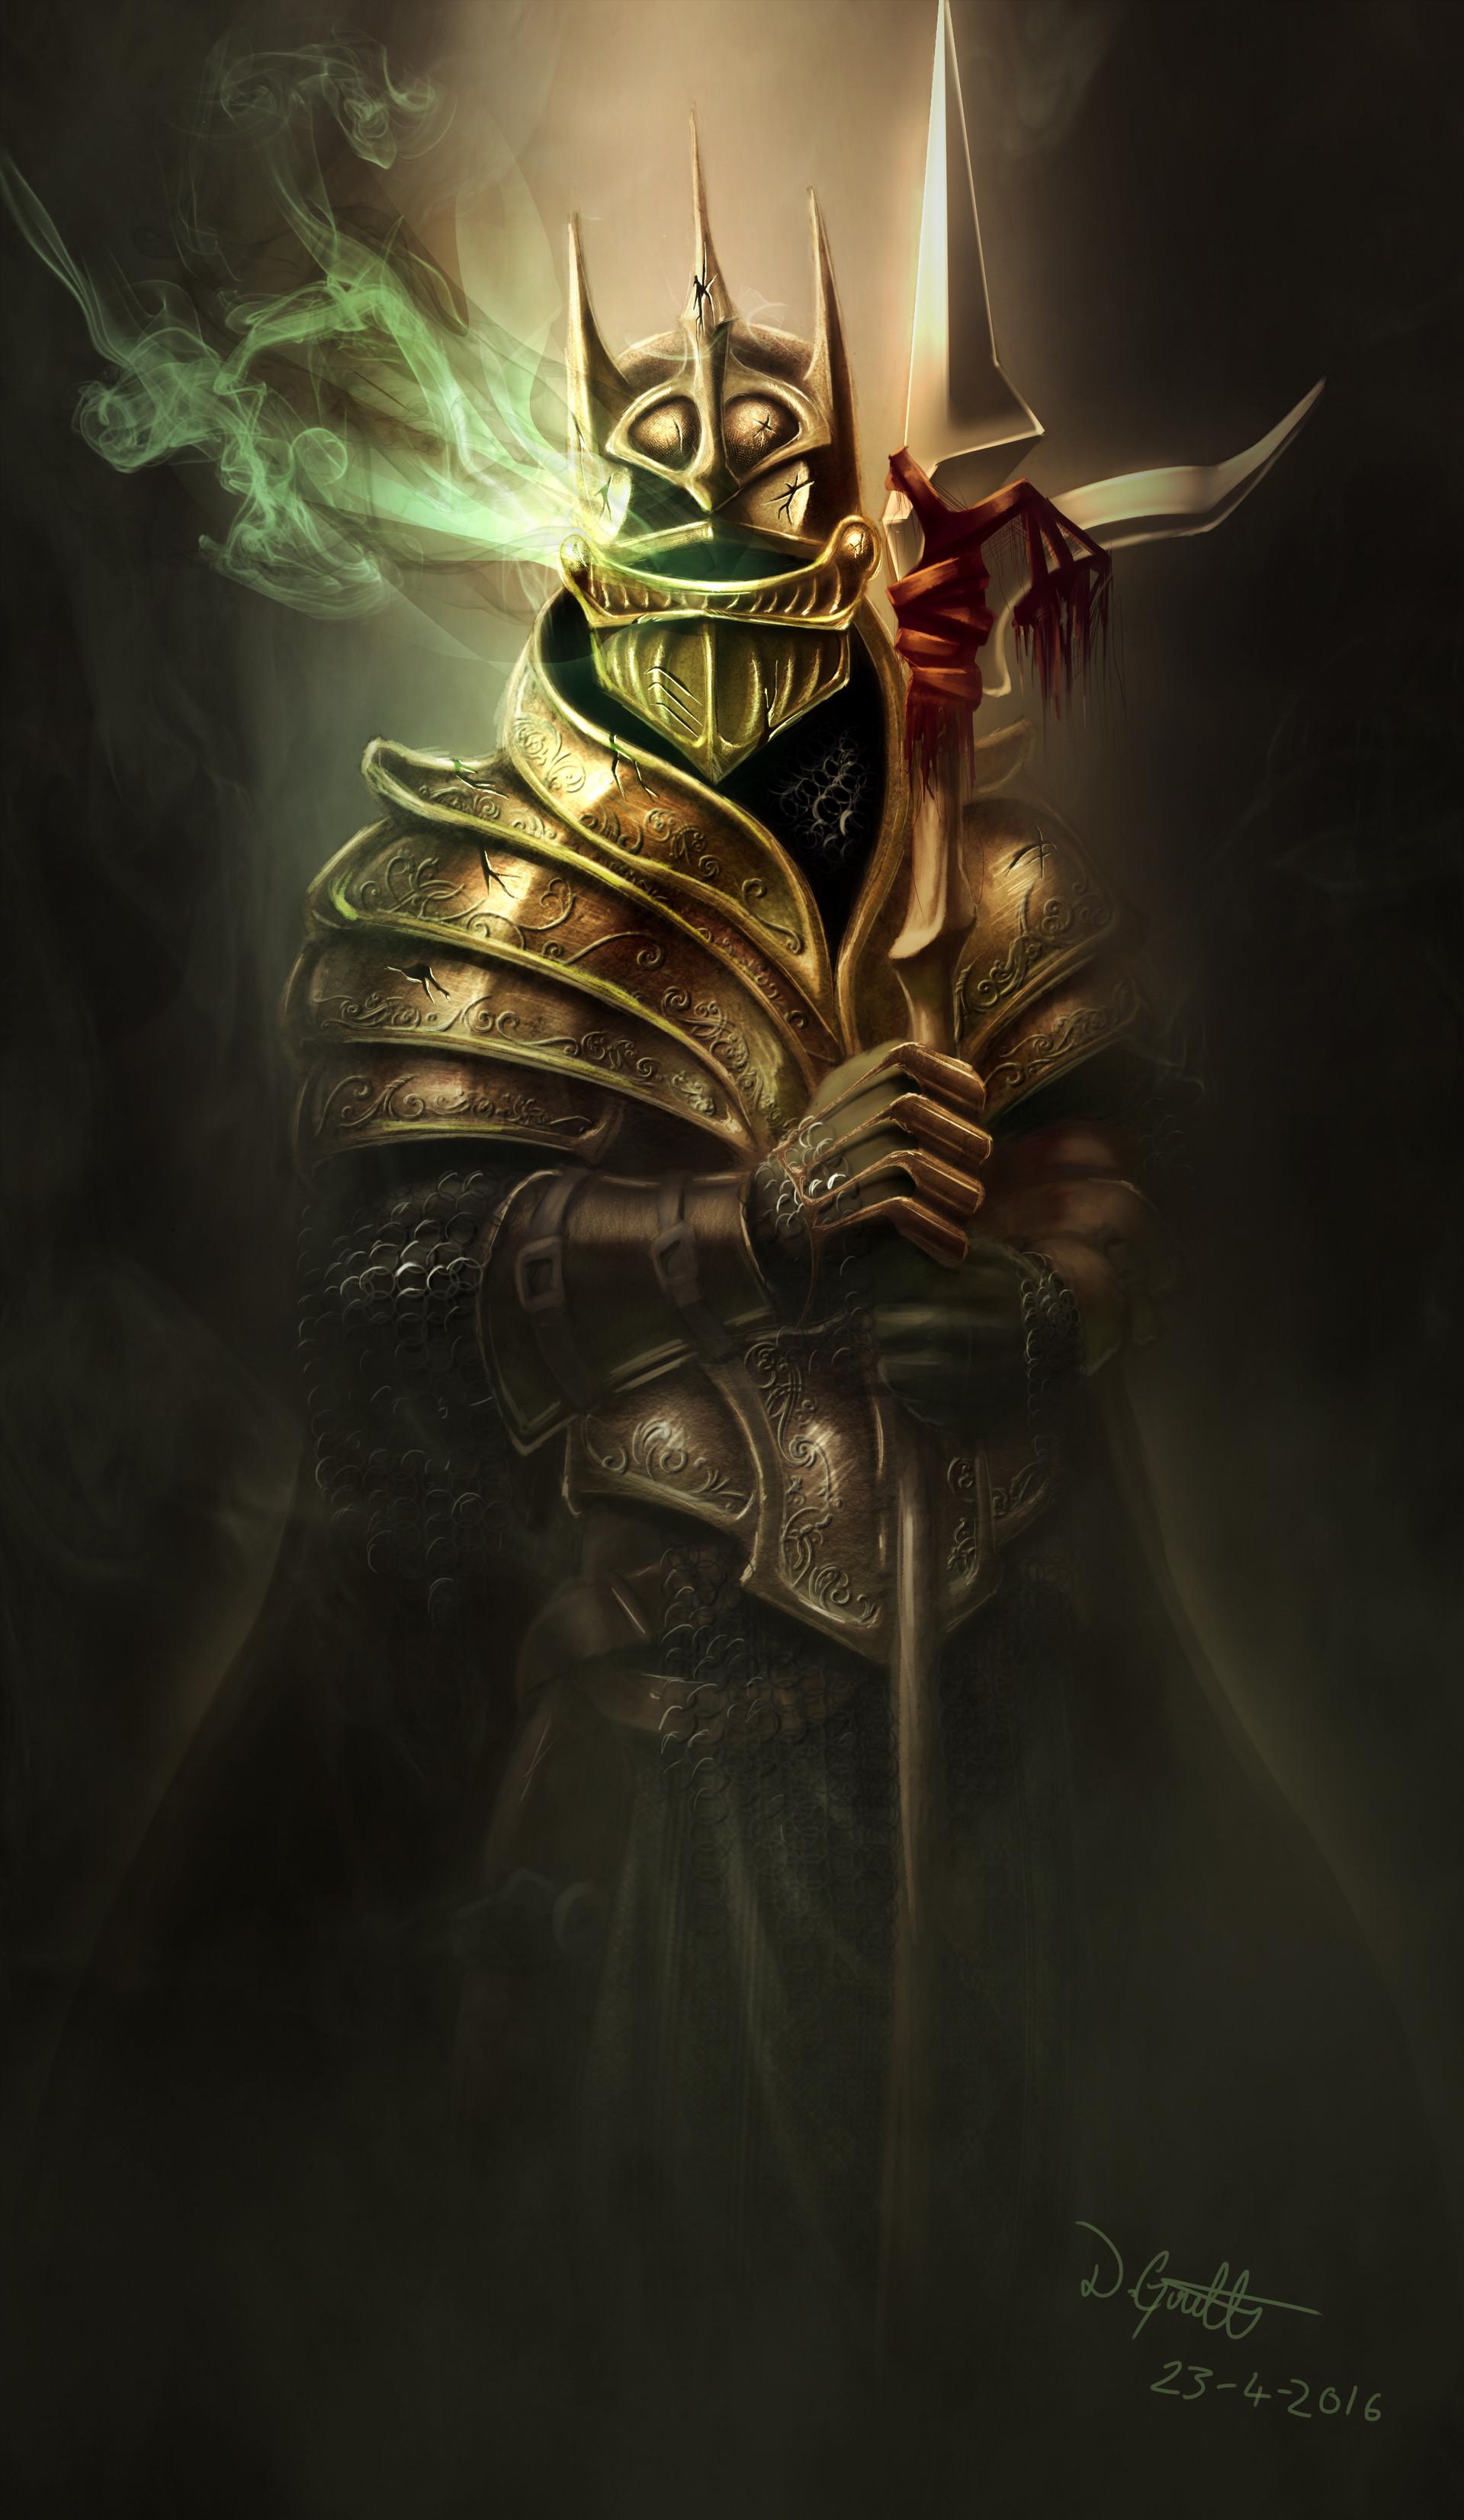 ArtStation - Knight Ethereal, Dane Goulter